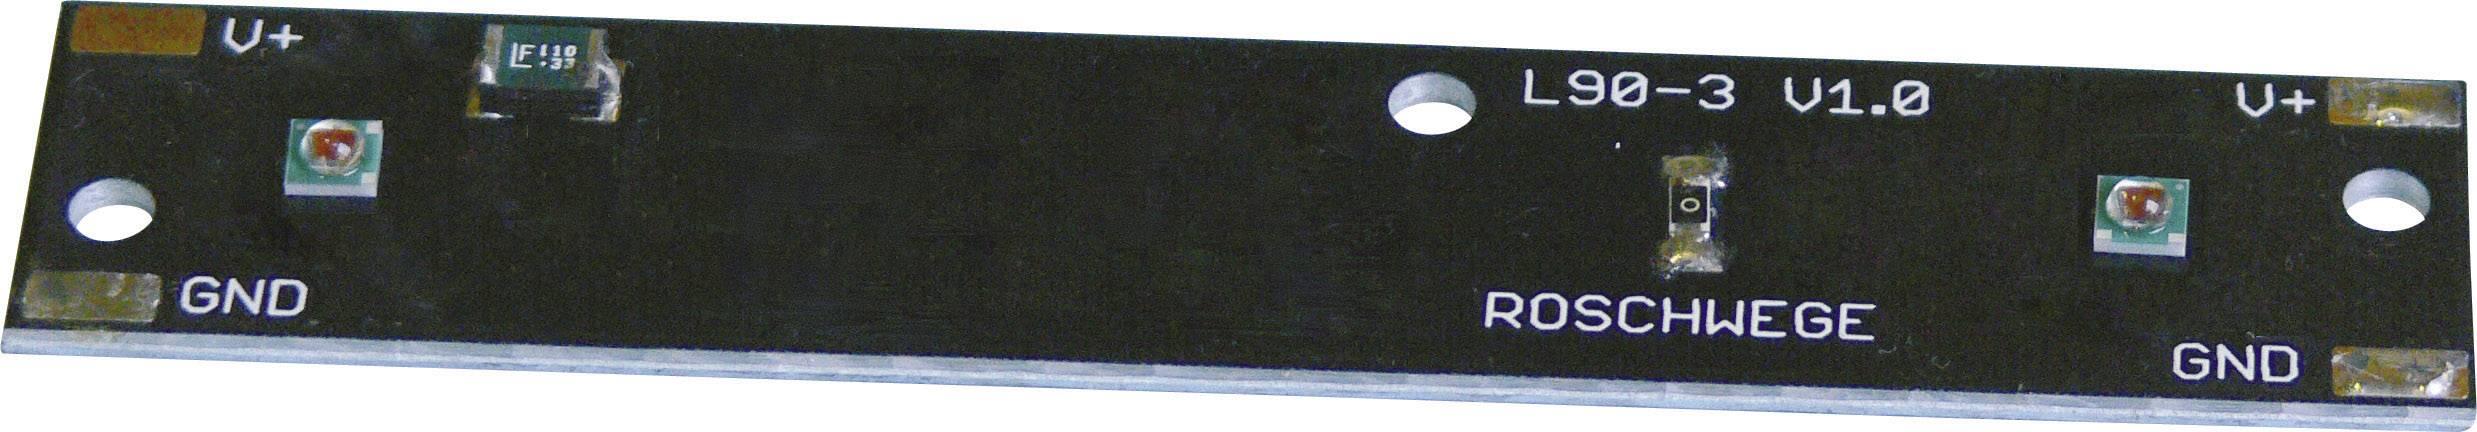 HighPower LED-lišta Roschwege 214 lm, denné svetlo